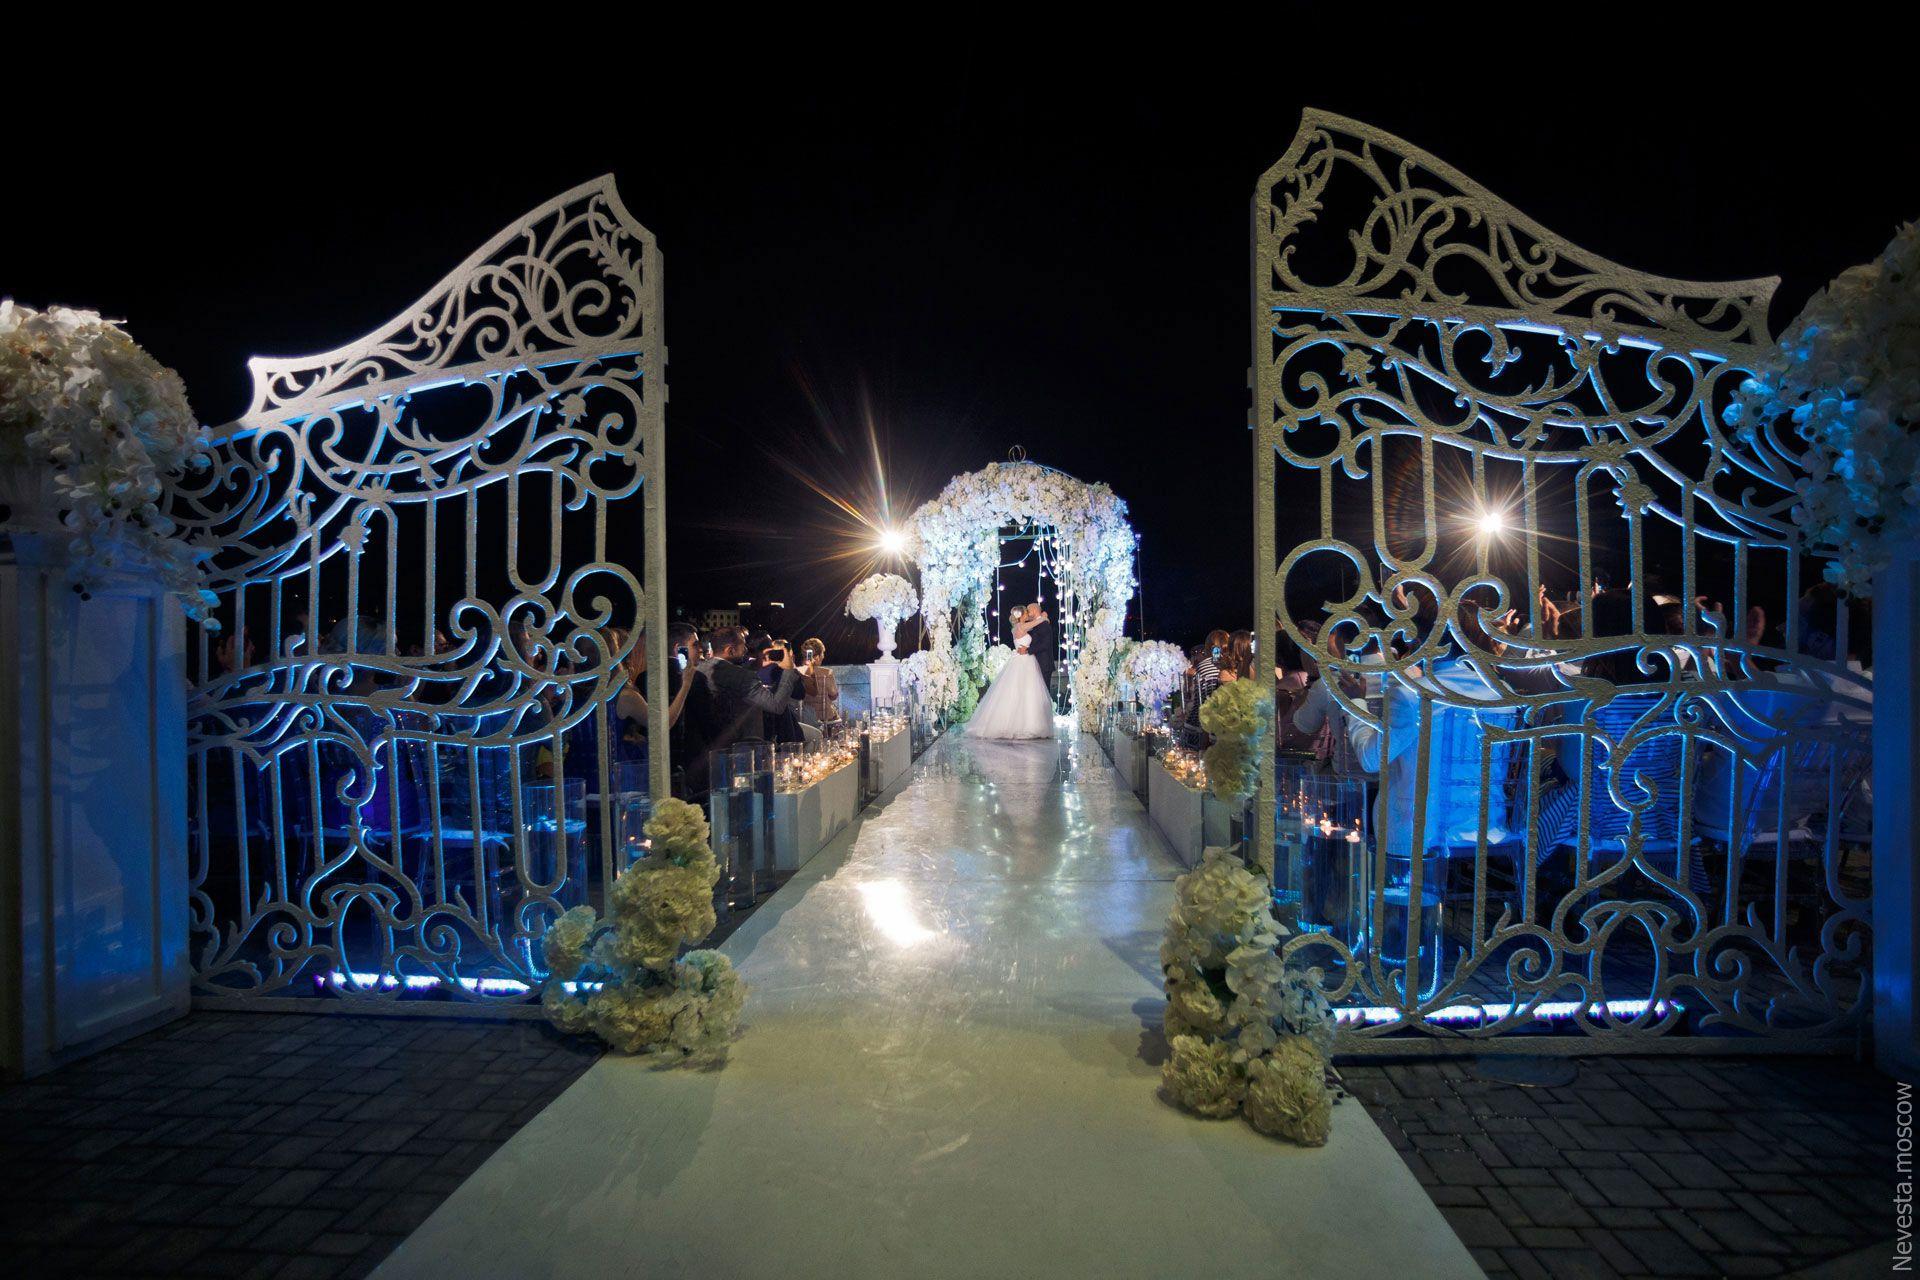 Свадьба Анны Хилькевич и Артура Волкова, фото 14